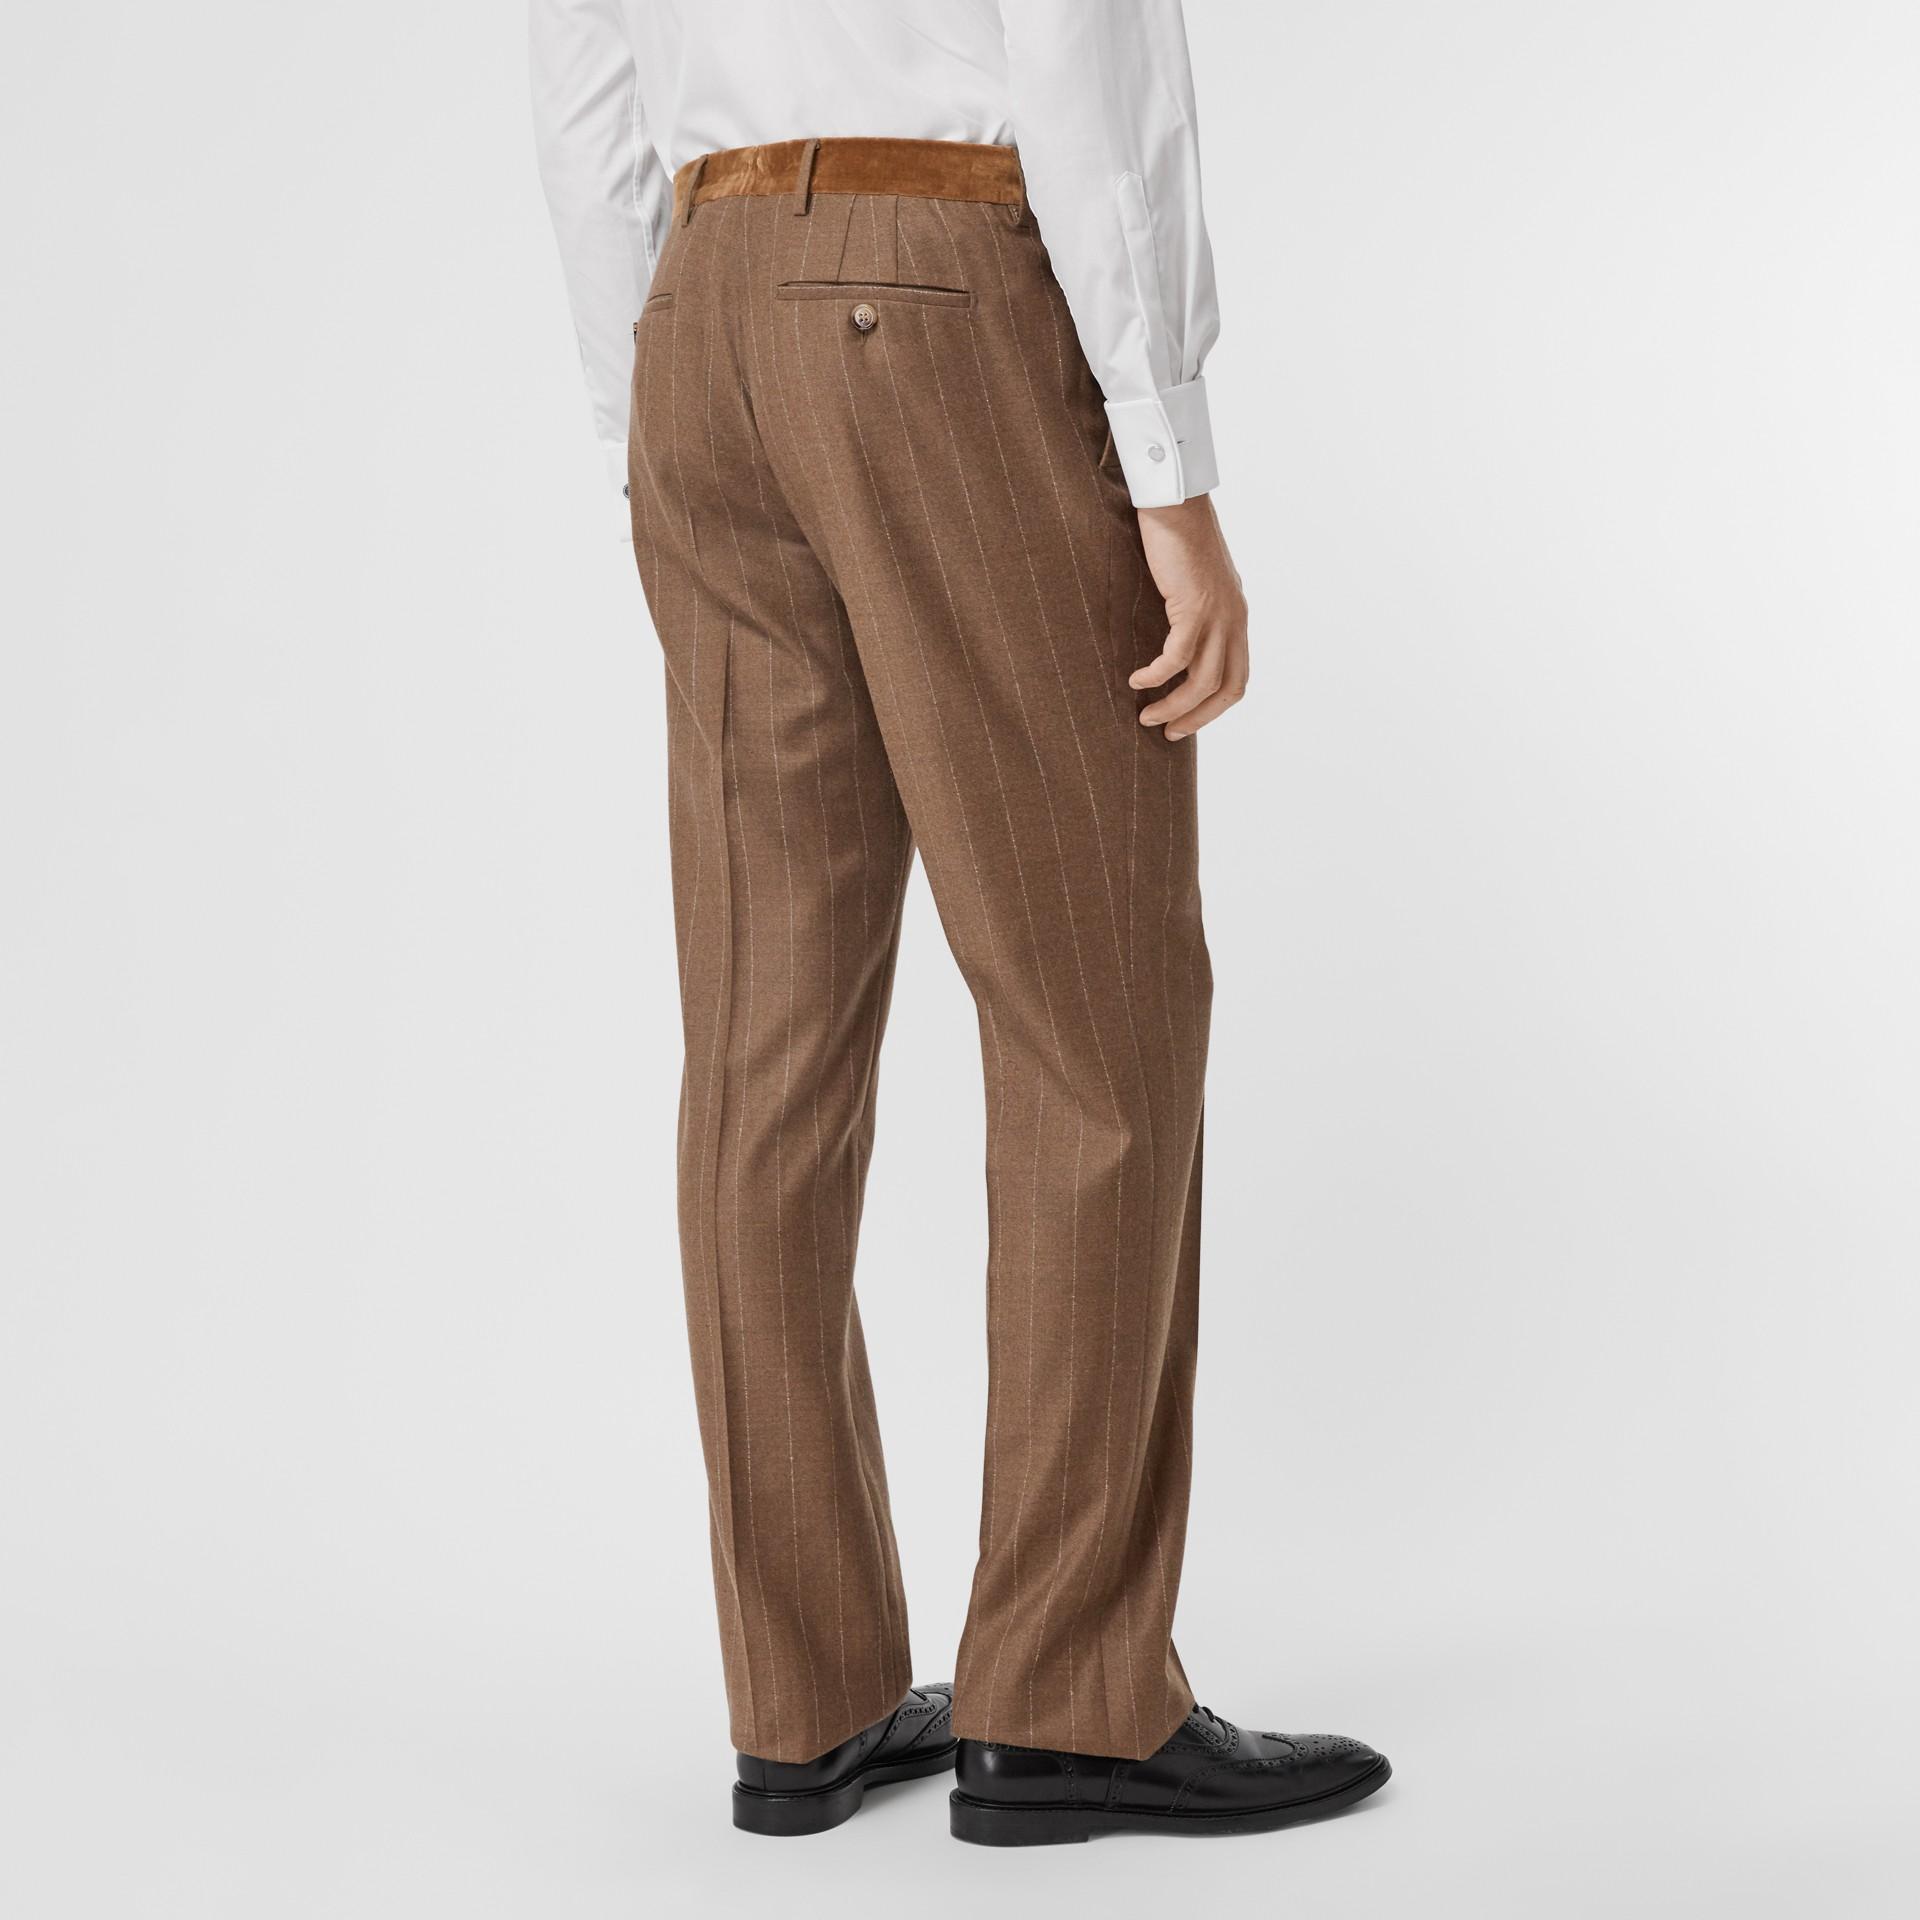 Classic Fit Velvet Trim Wool Cashmere Trousers in Dark Tan - Men | Burberry - gallery image 2